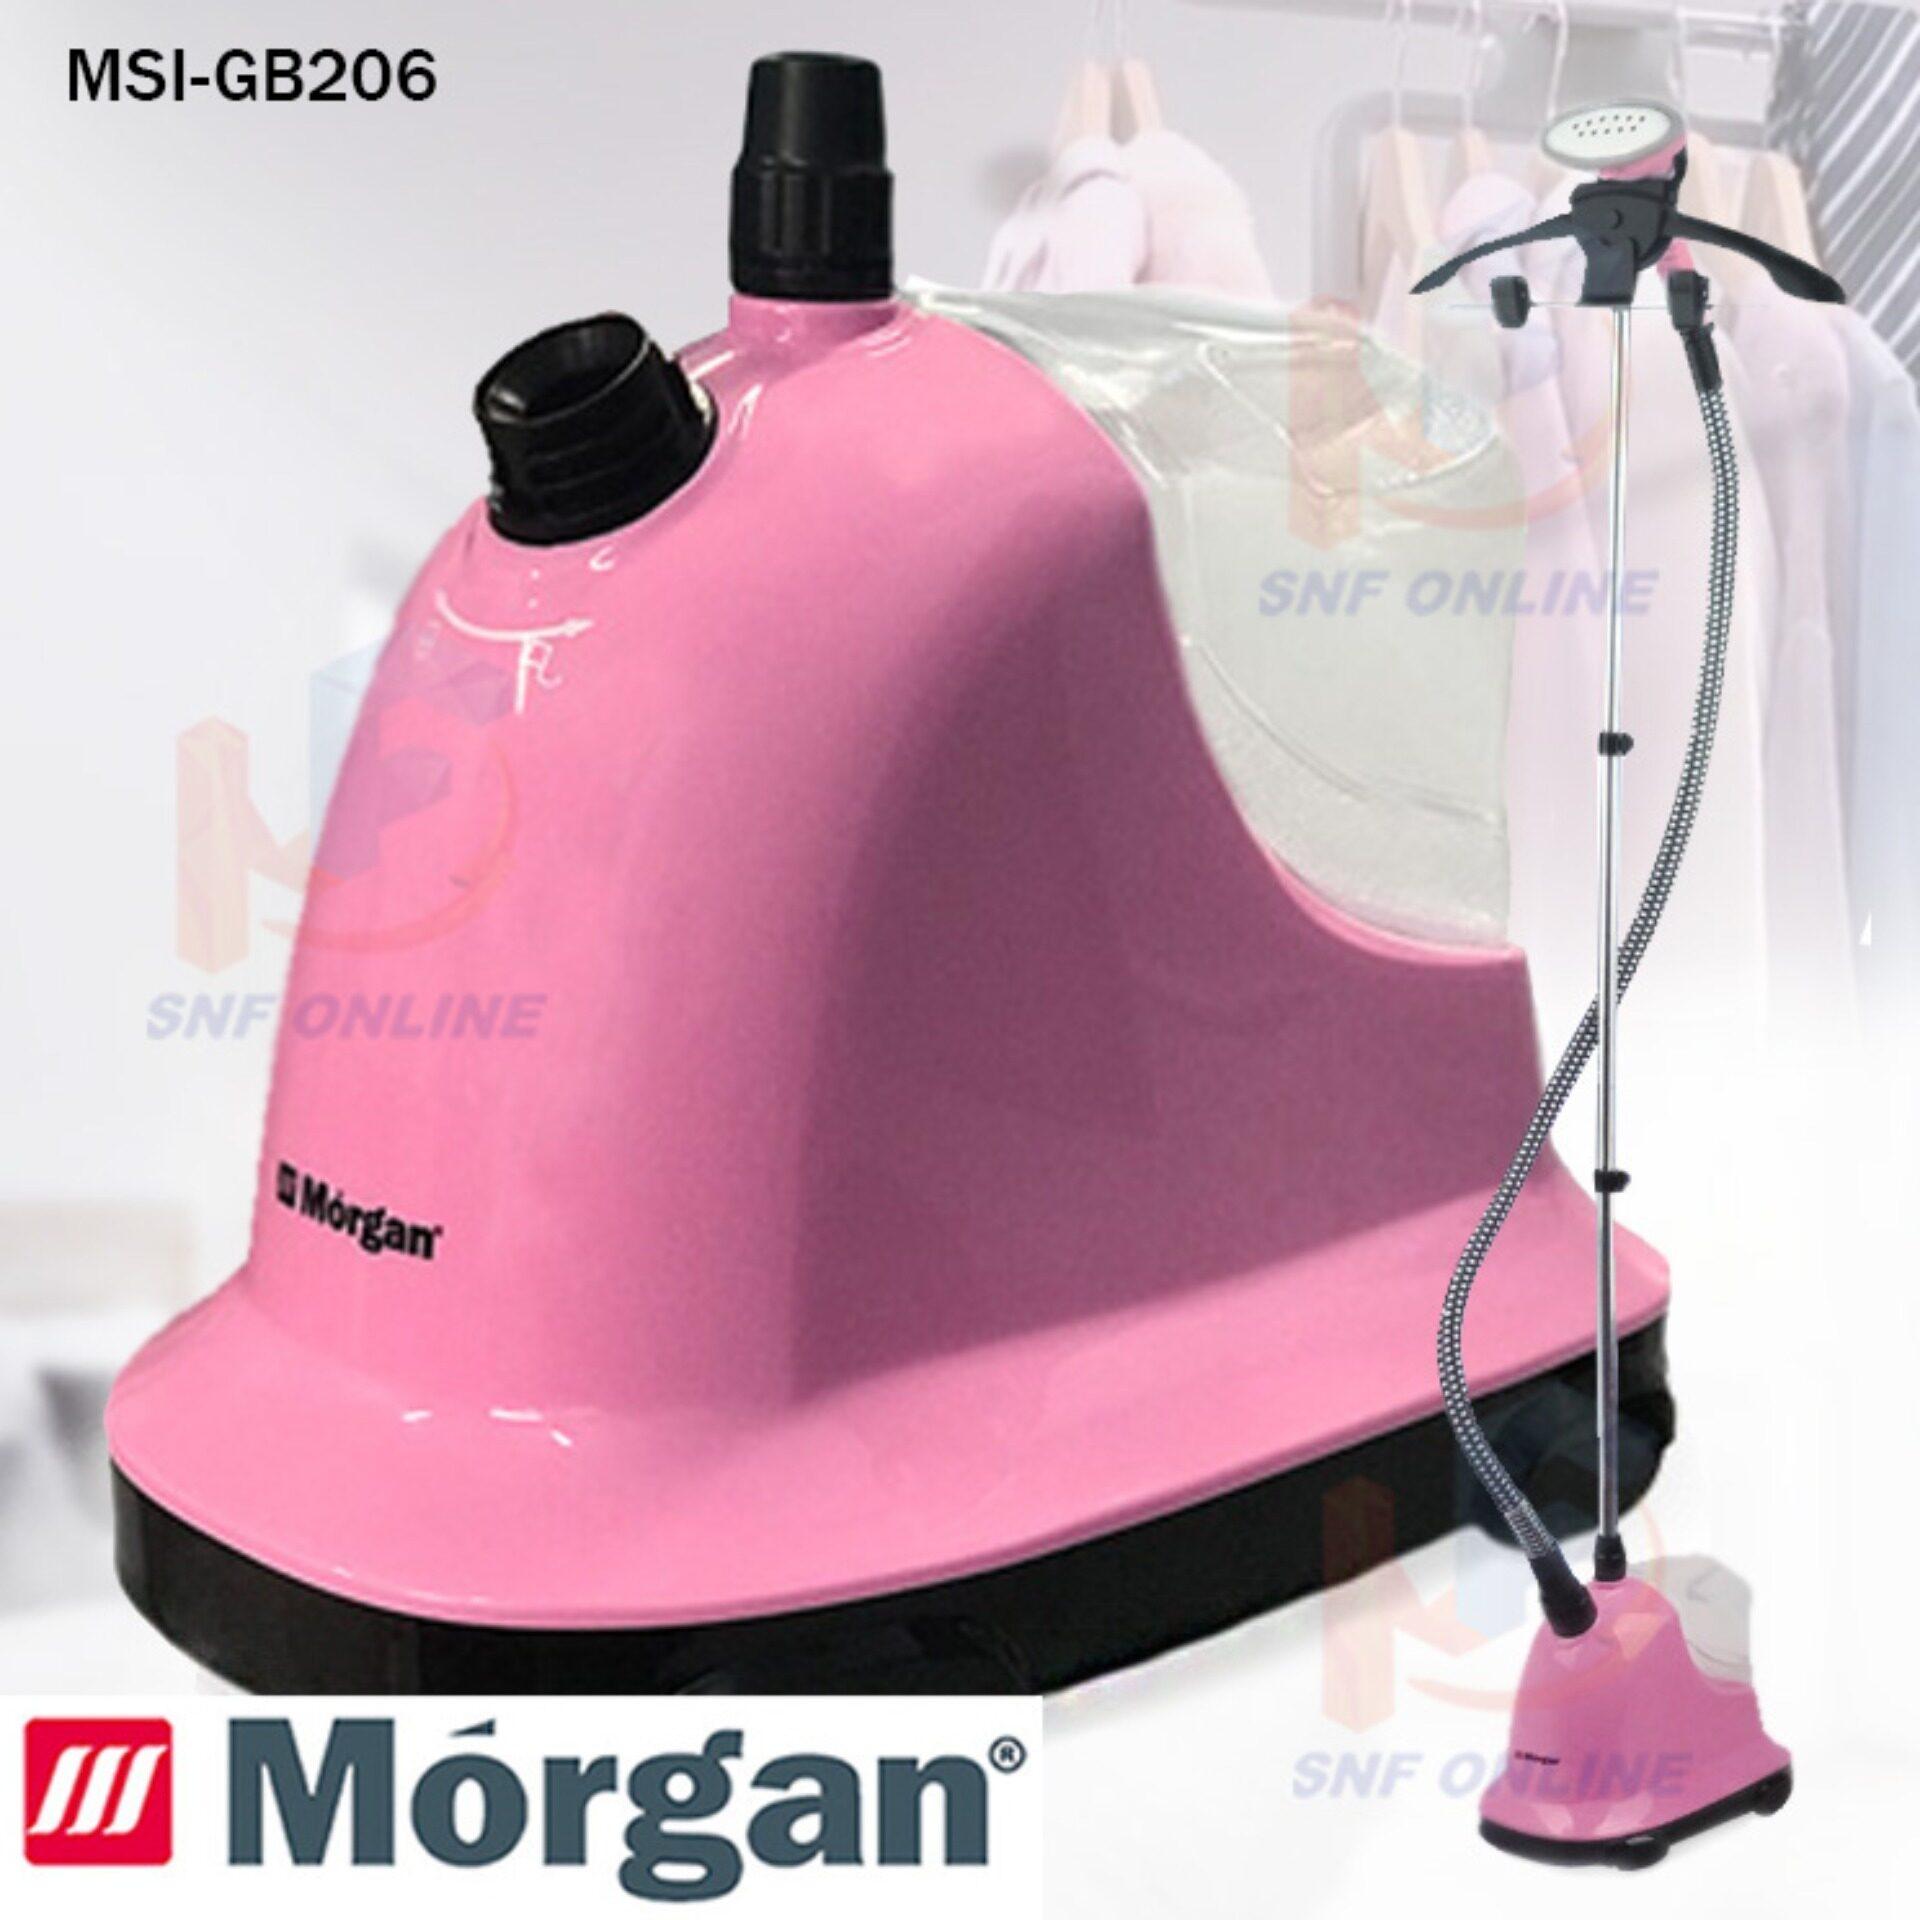 Morgan Garment Steamer MSI-GB206 MSIGB206